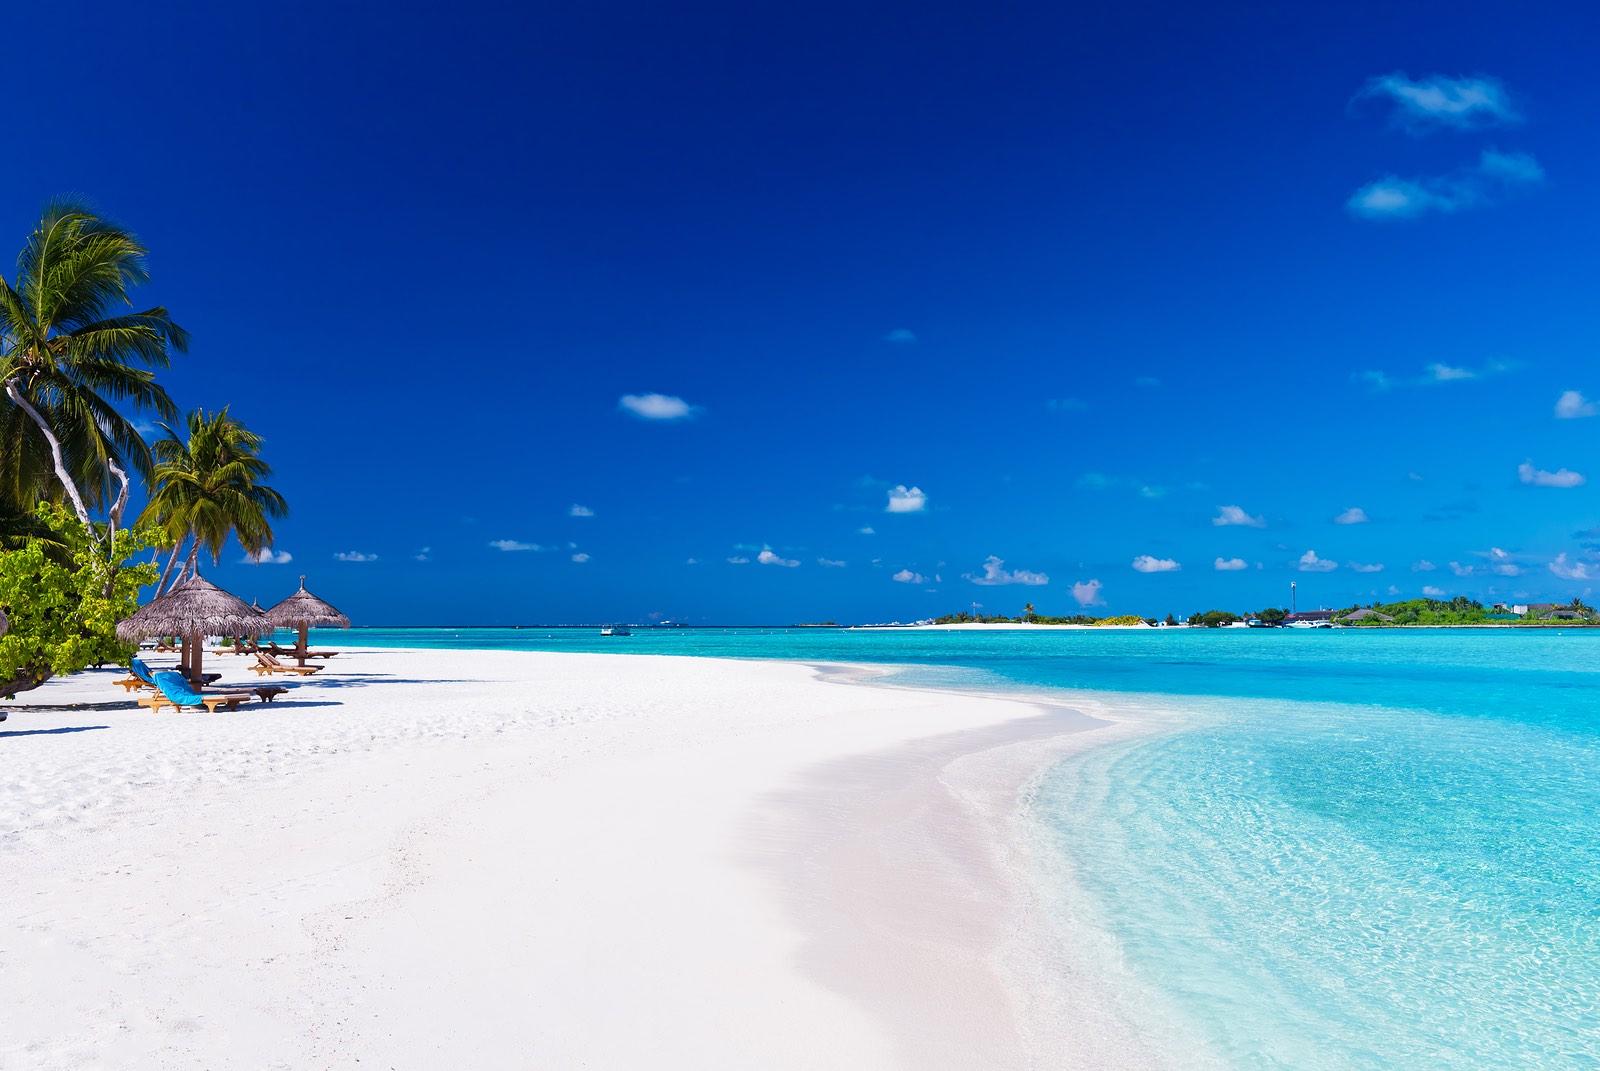 bigstock-Palm-trees-over-stunning-lagoo-30676202